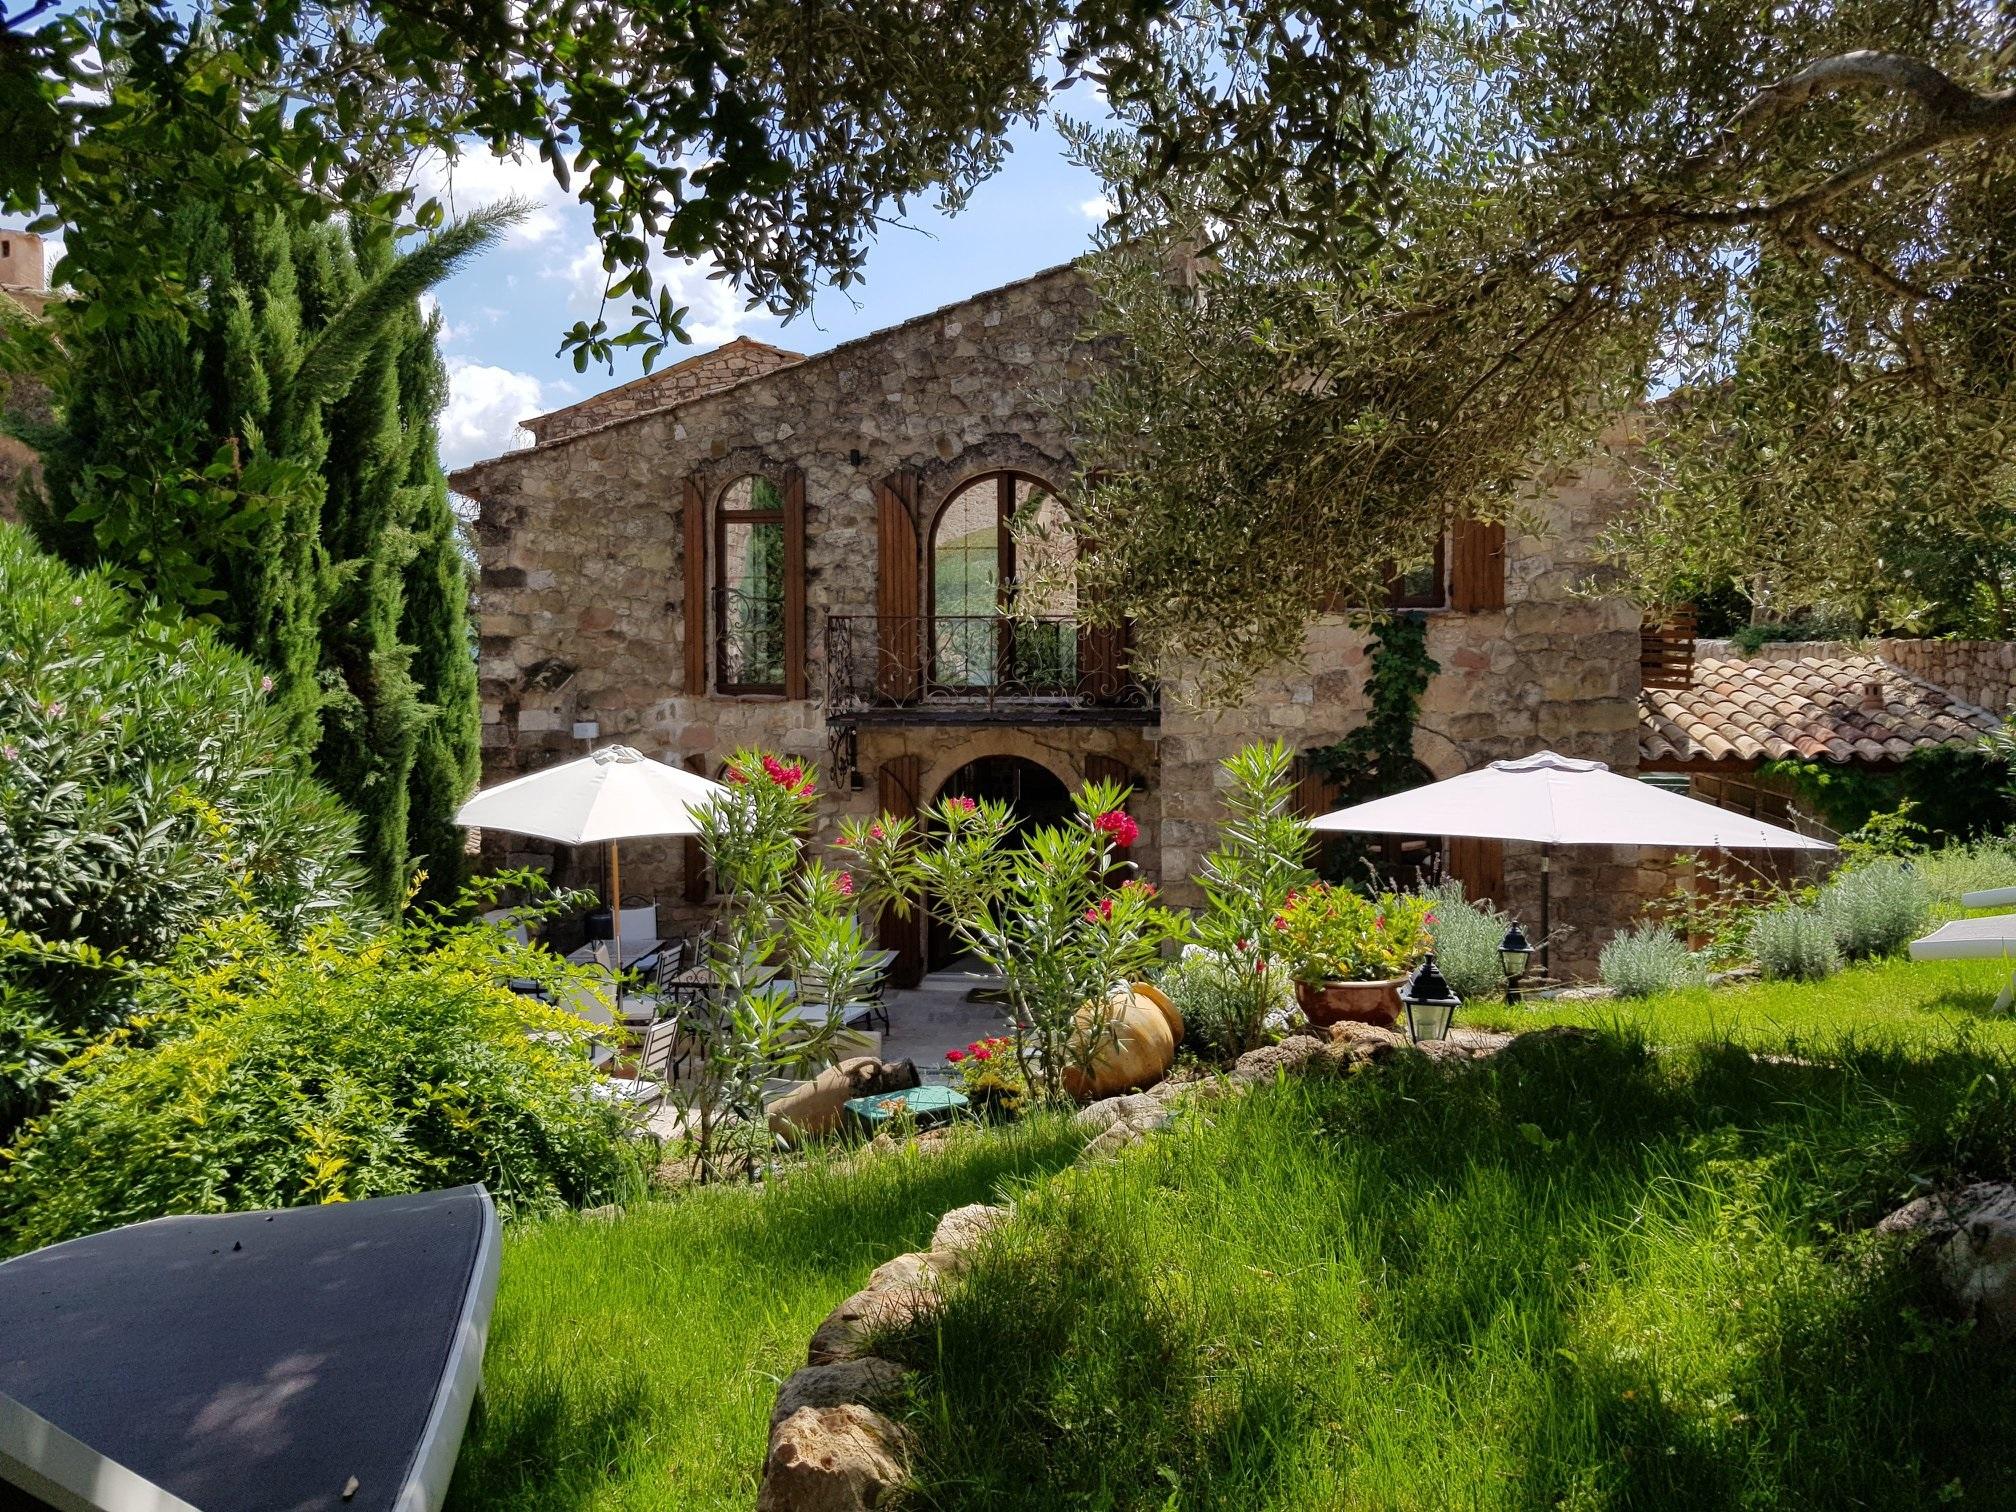 Villa Arca - Oger Emilia